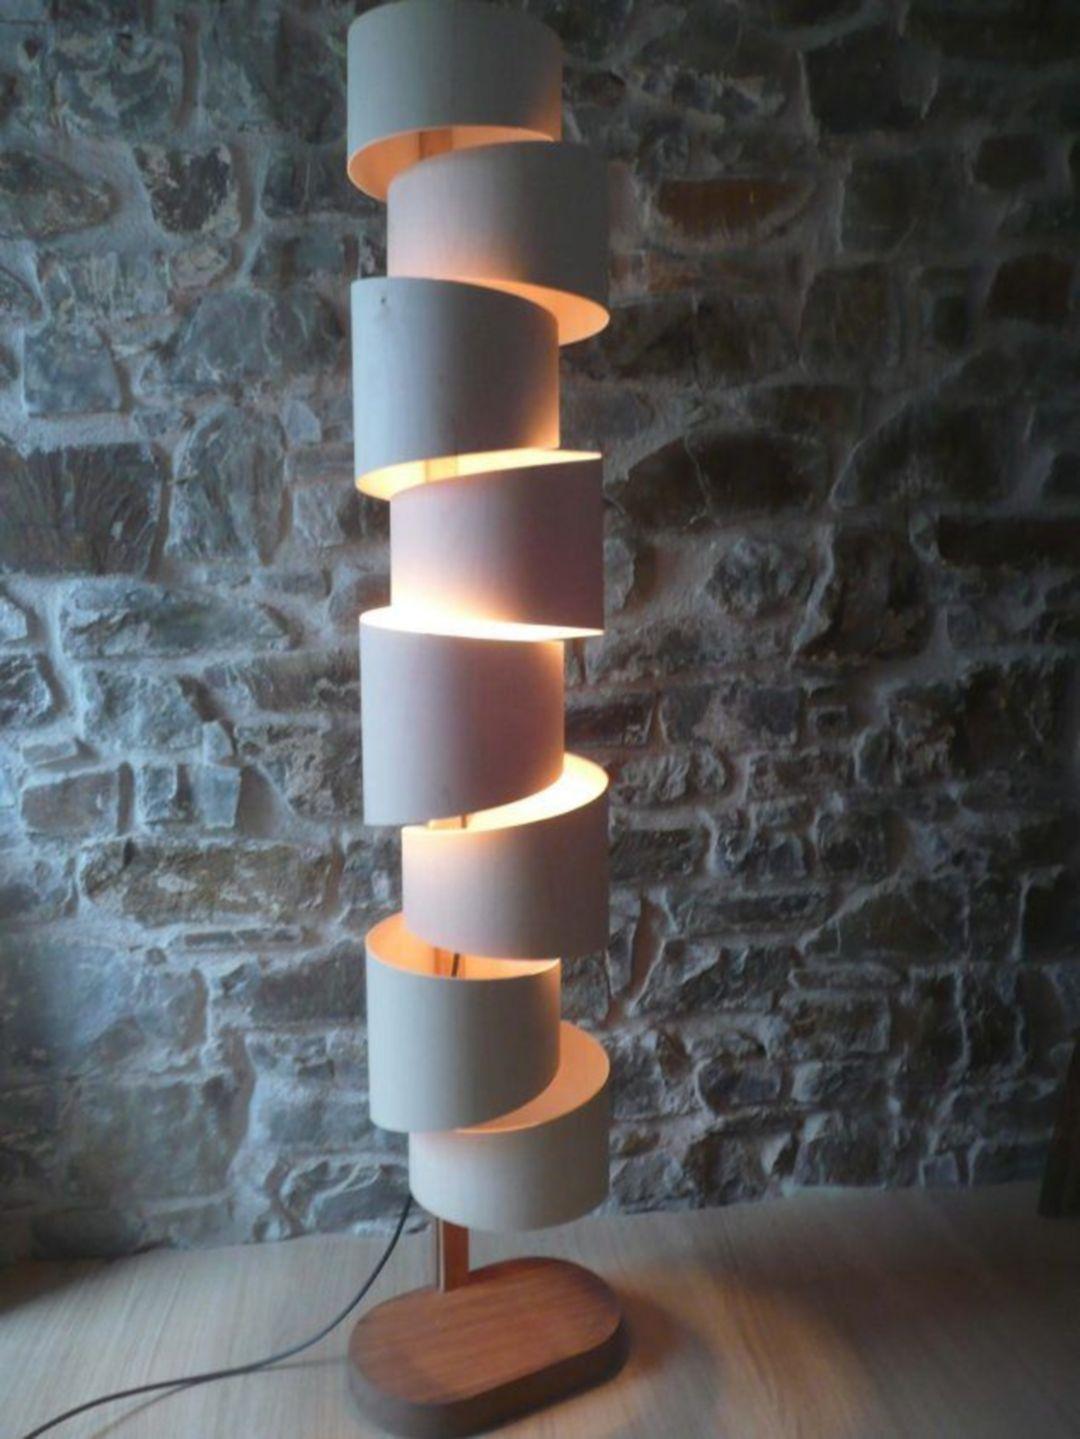 30 Unique Bedroom Lamp Decorations For Elegant Bedrooms Ideas Unique Floor Lamps Lamp Decor House Lamp